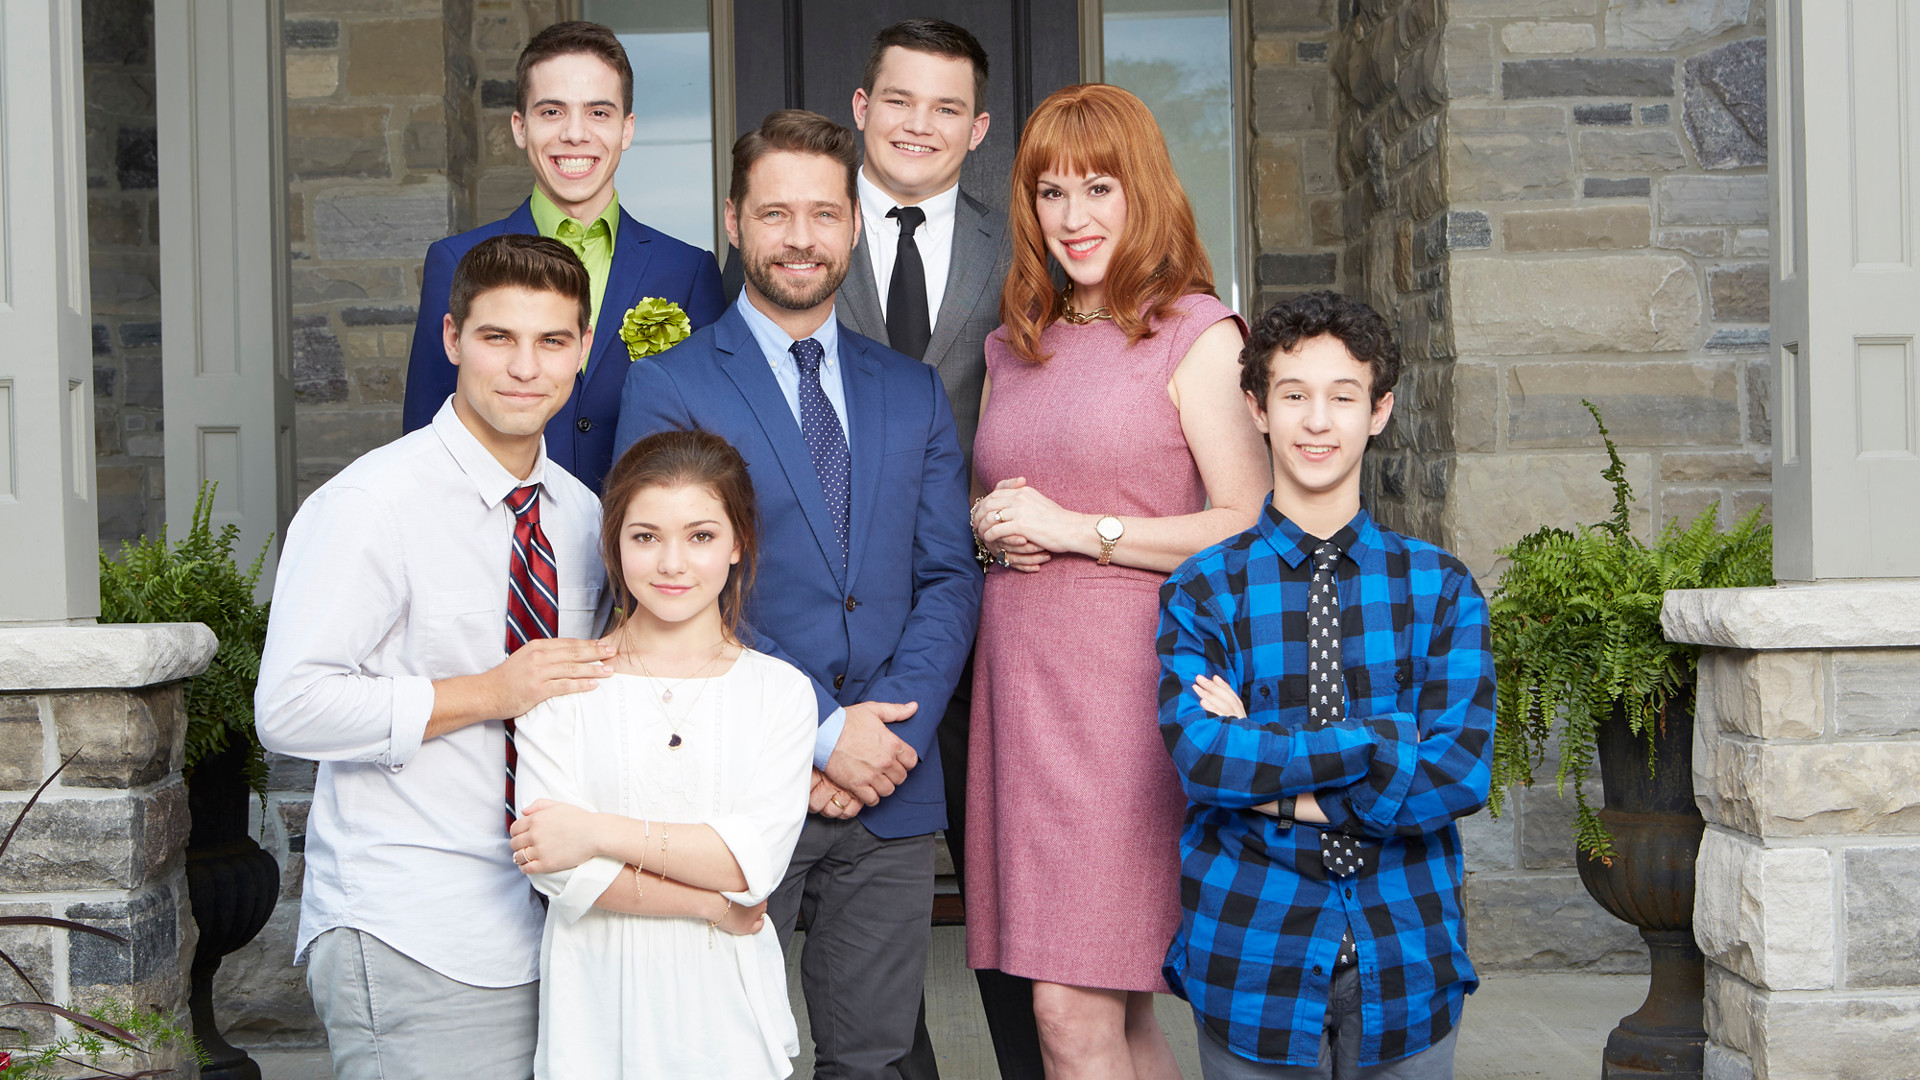 Family business season 1 download